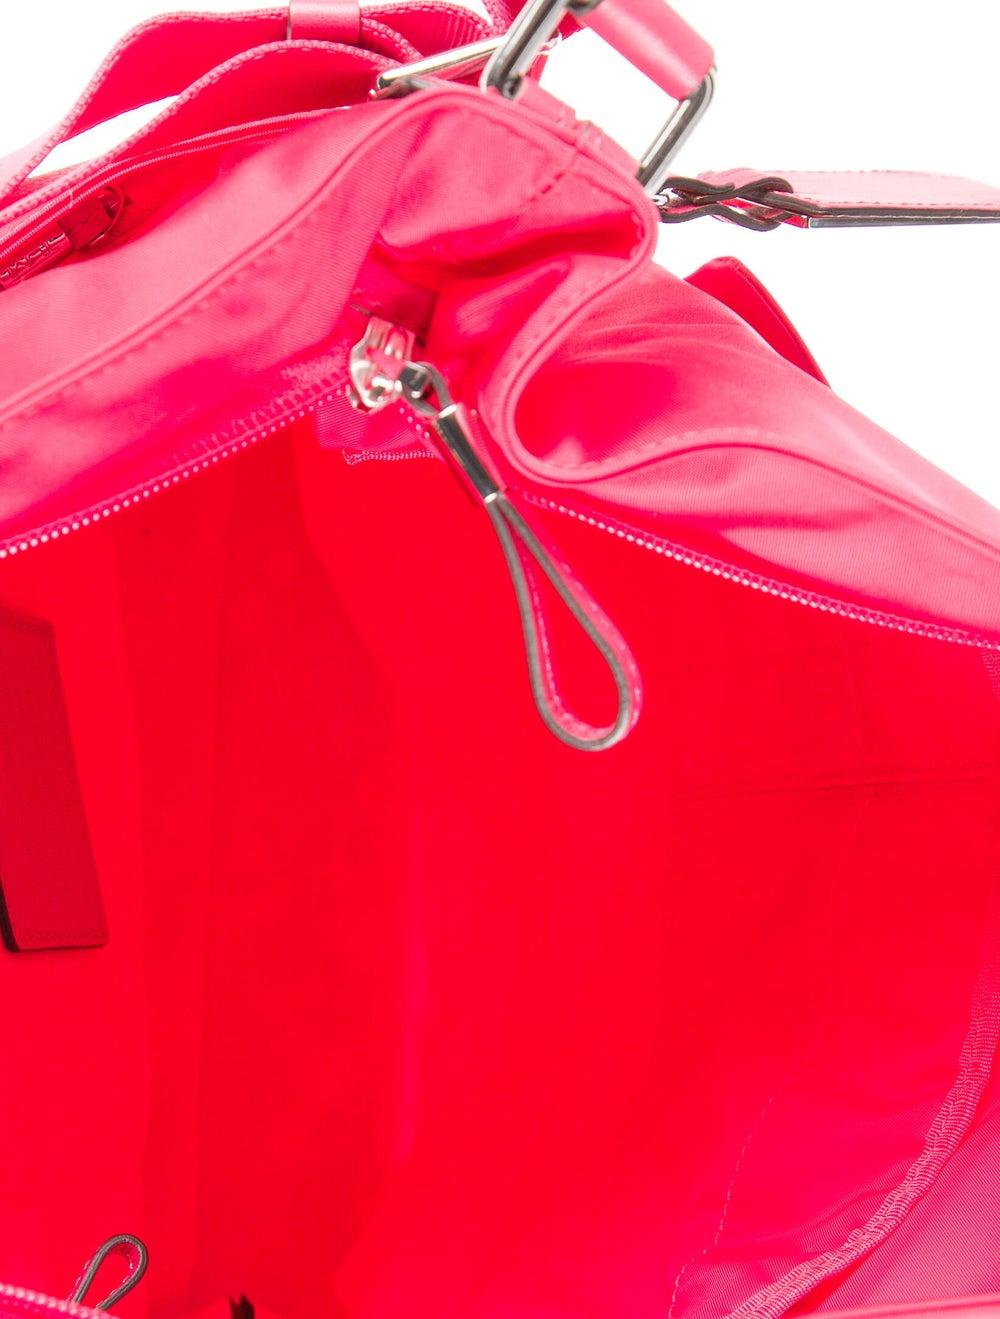 Tumi Nylon Shoulder Bag Pink - image 5